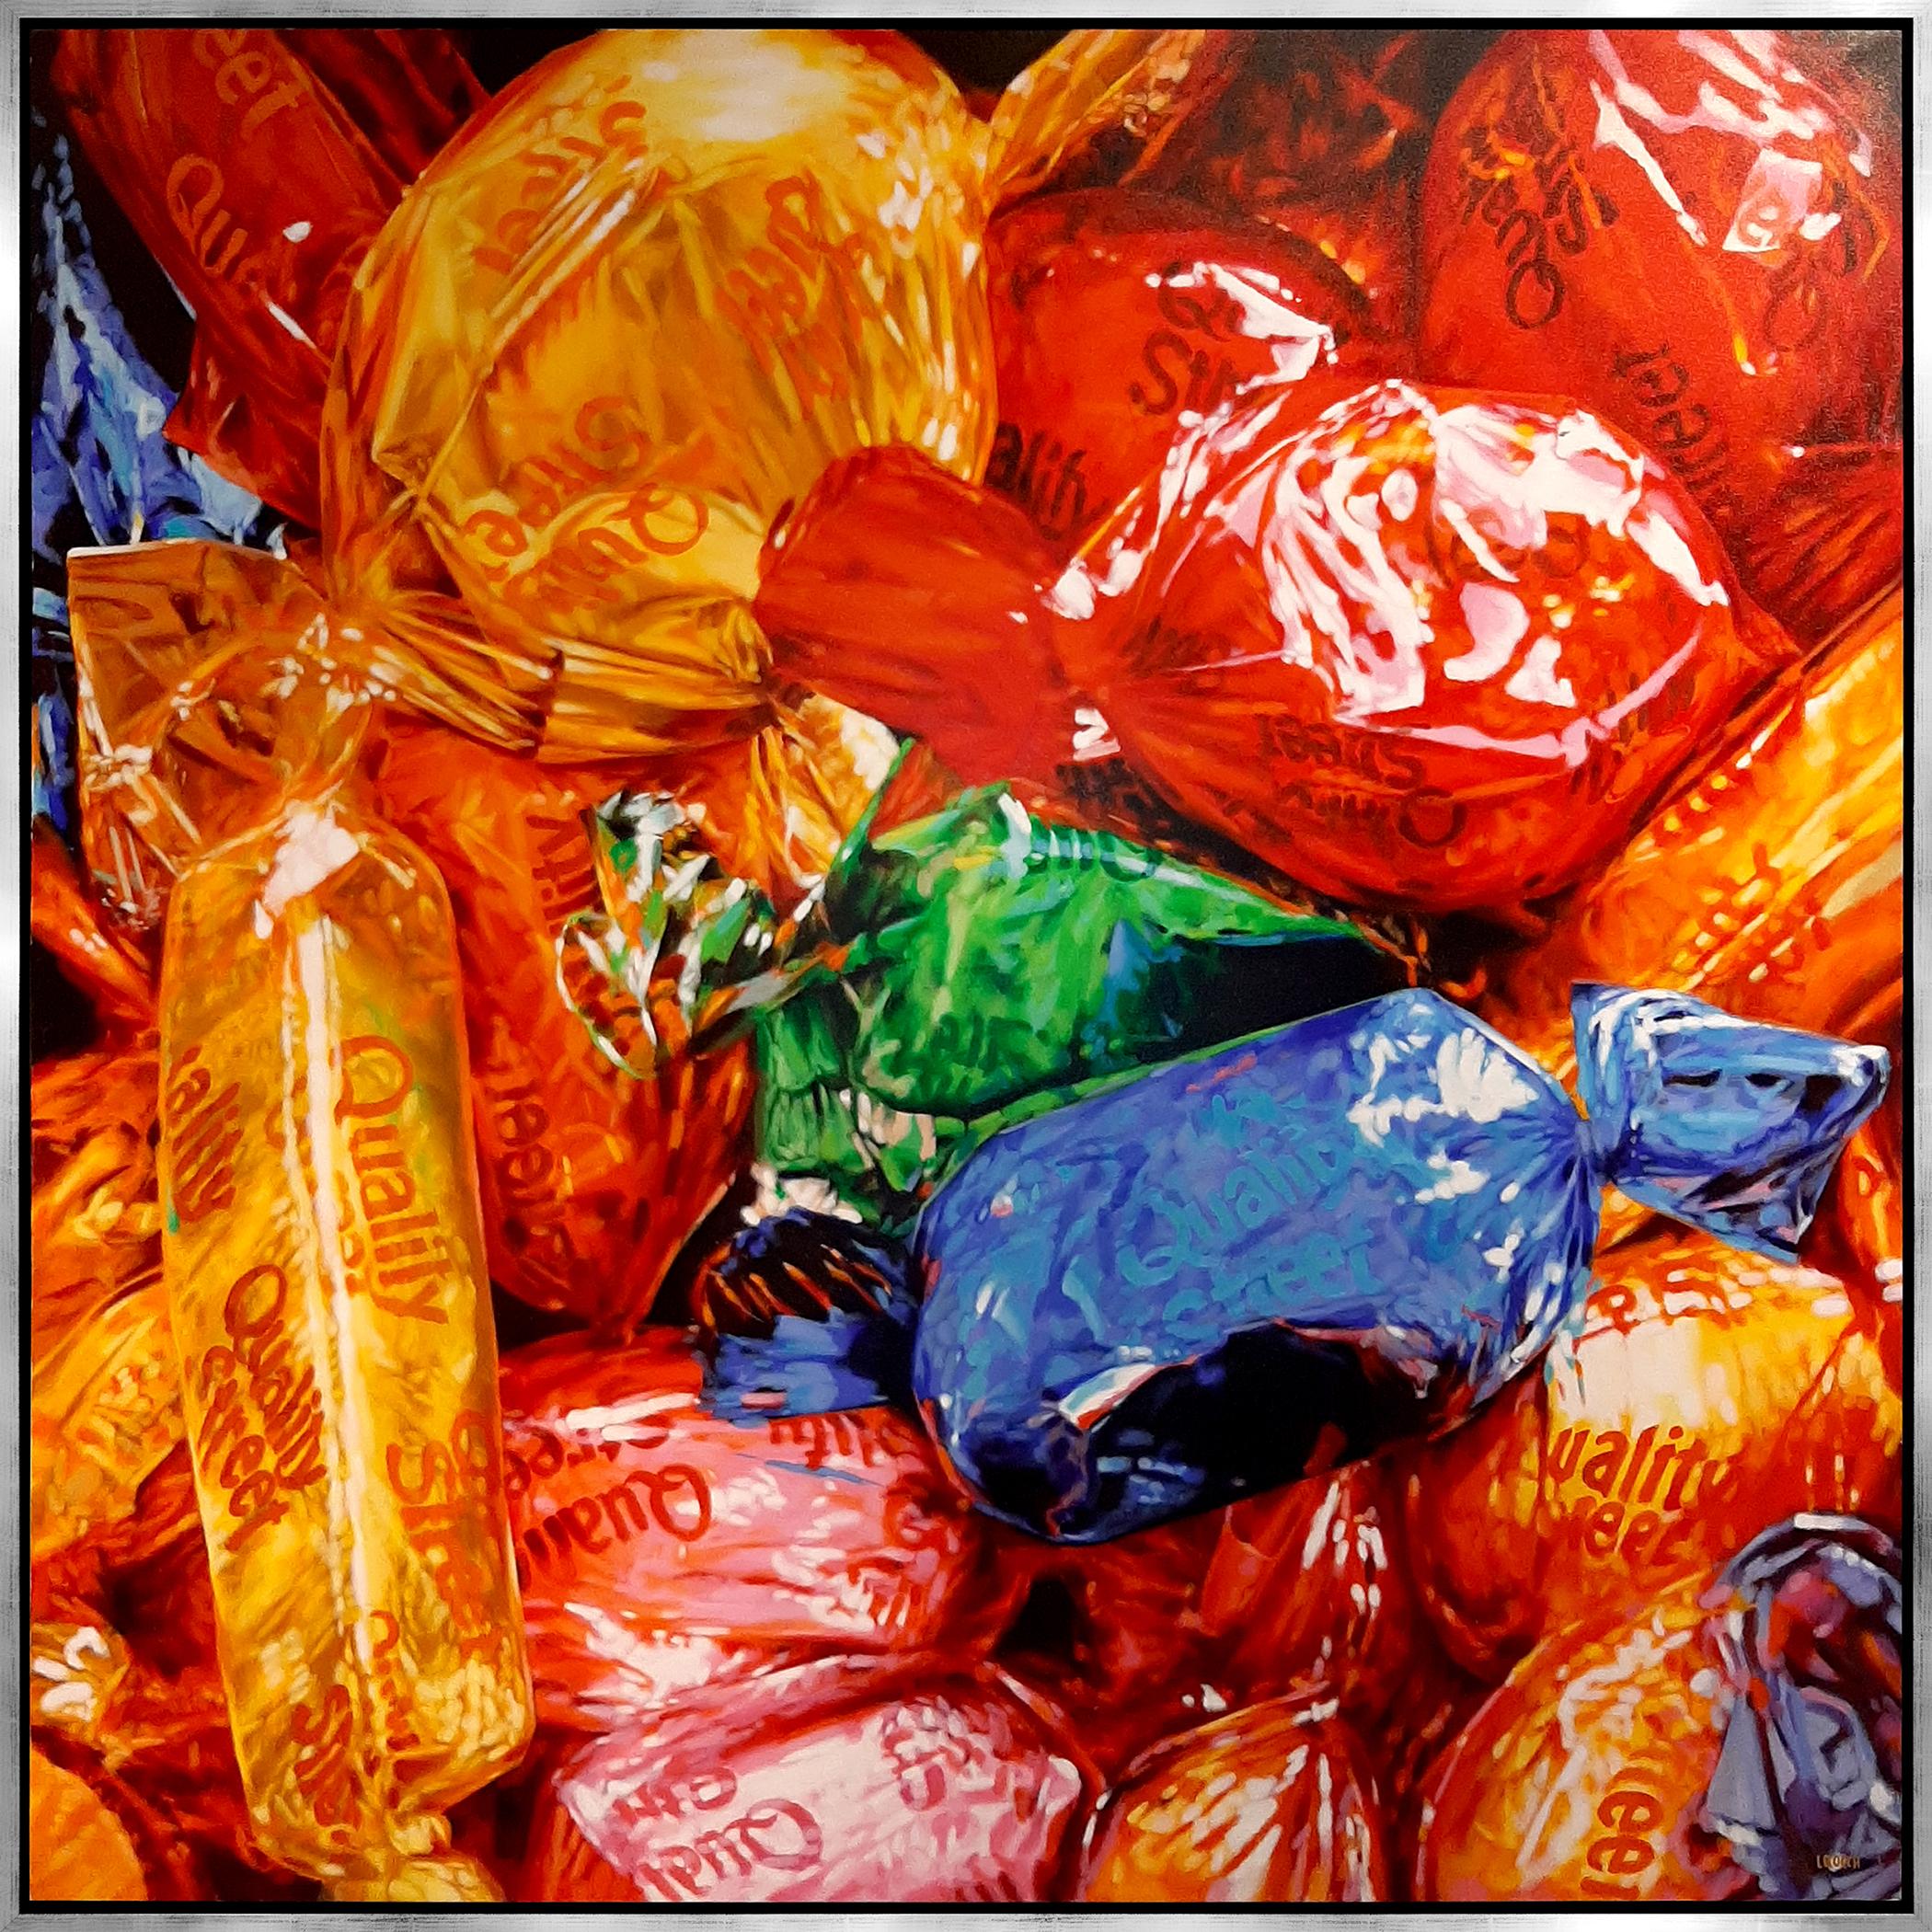 Luigi Rocca - Oh my Sweetness , 6855-006-080